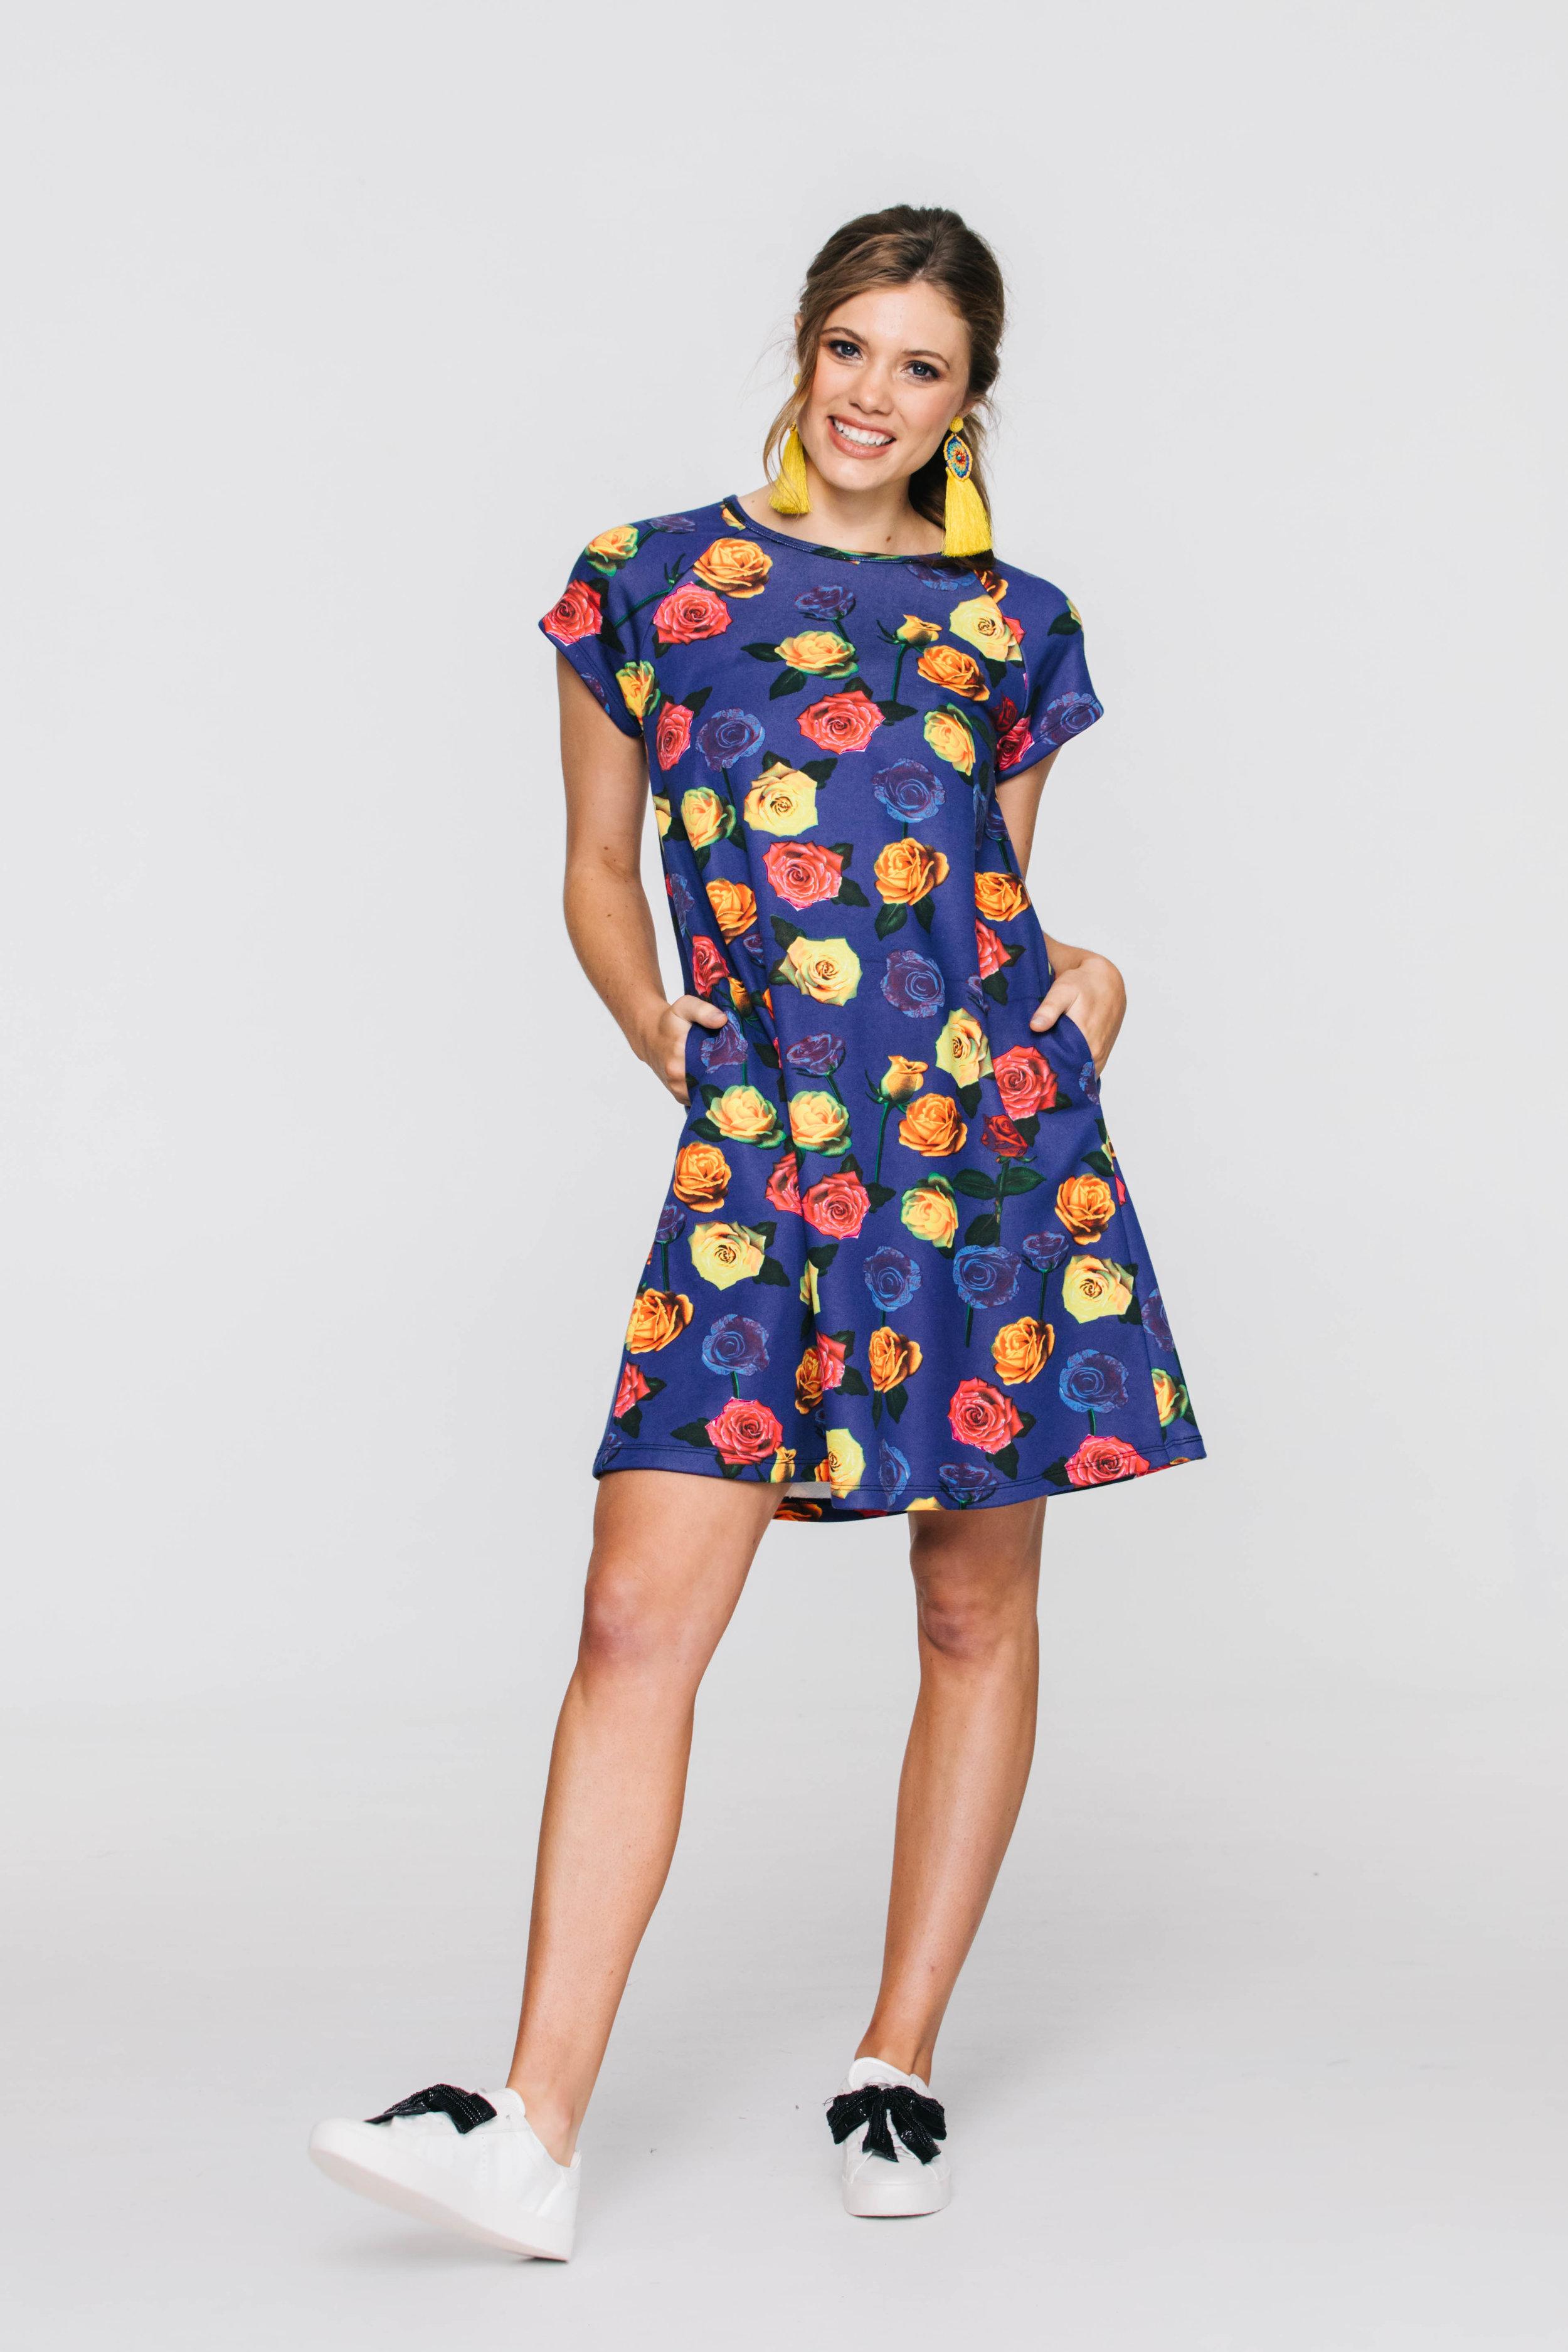 6032V Sweat Dress, Sweaty Betty Blue